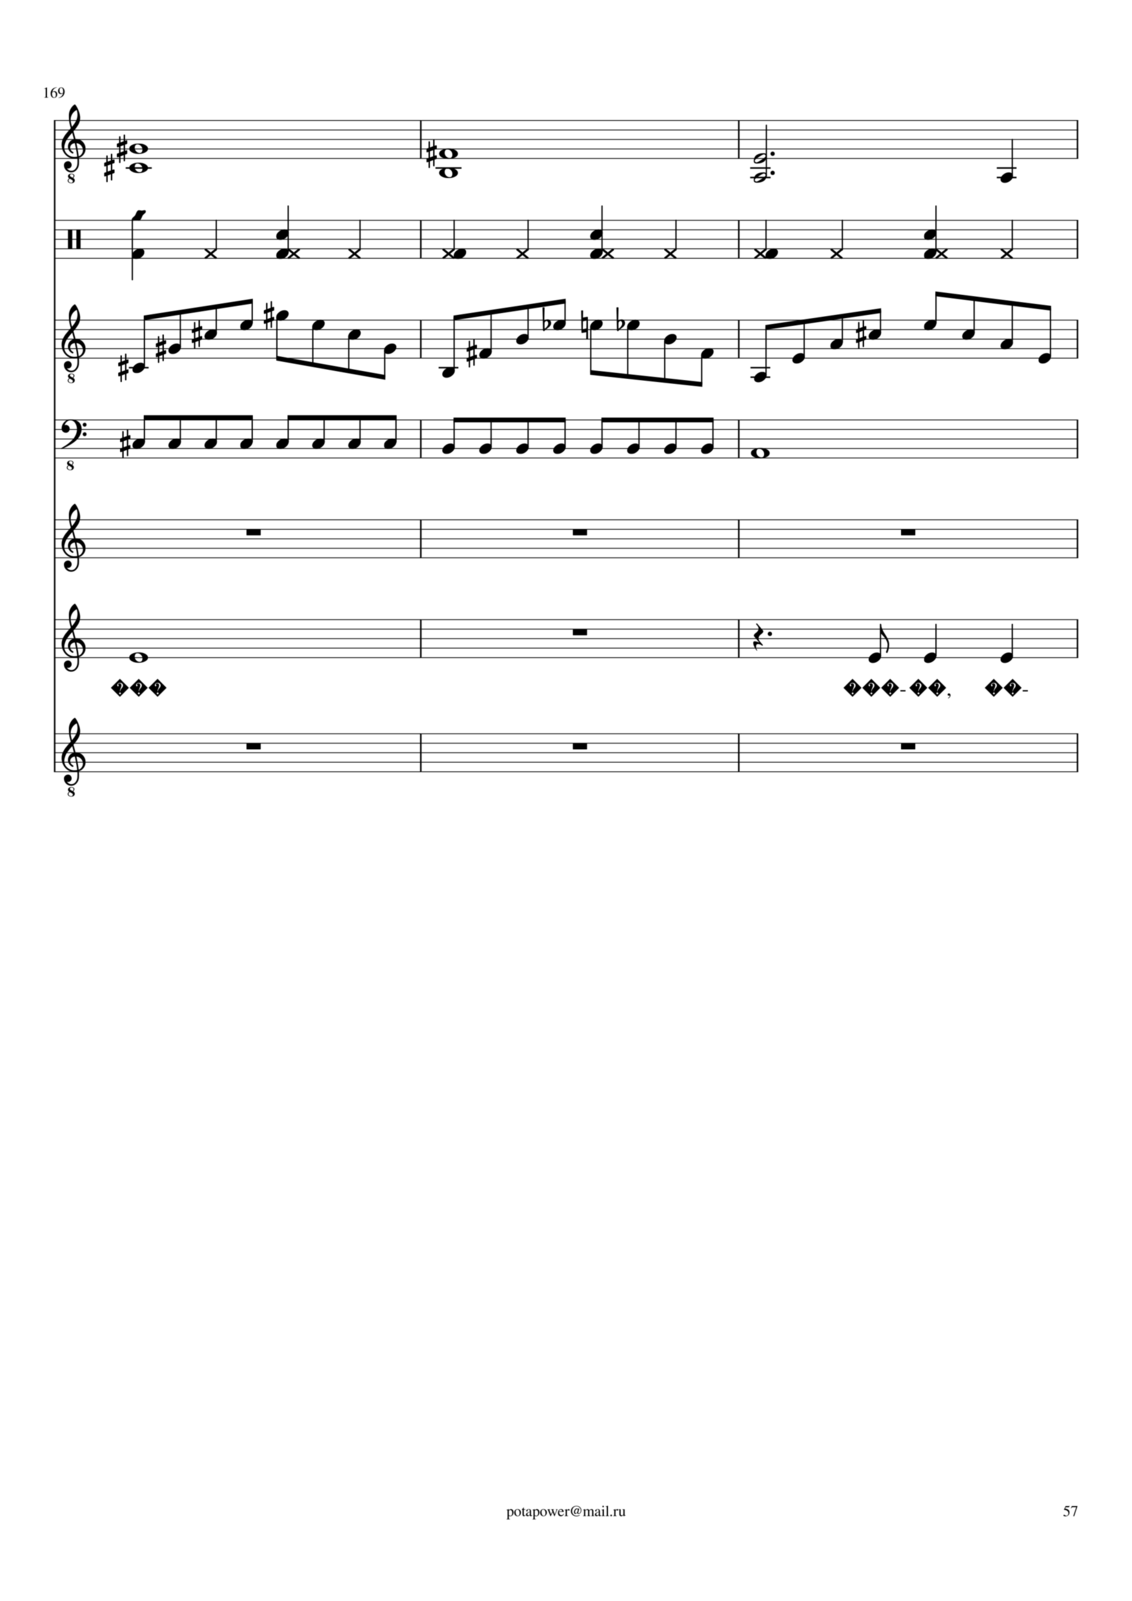 Ten lyubvi slide, Image 57